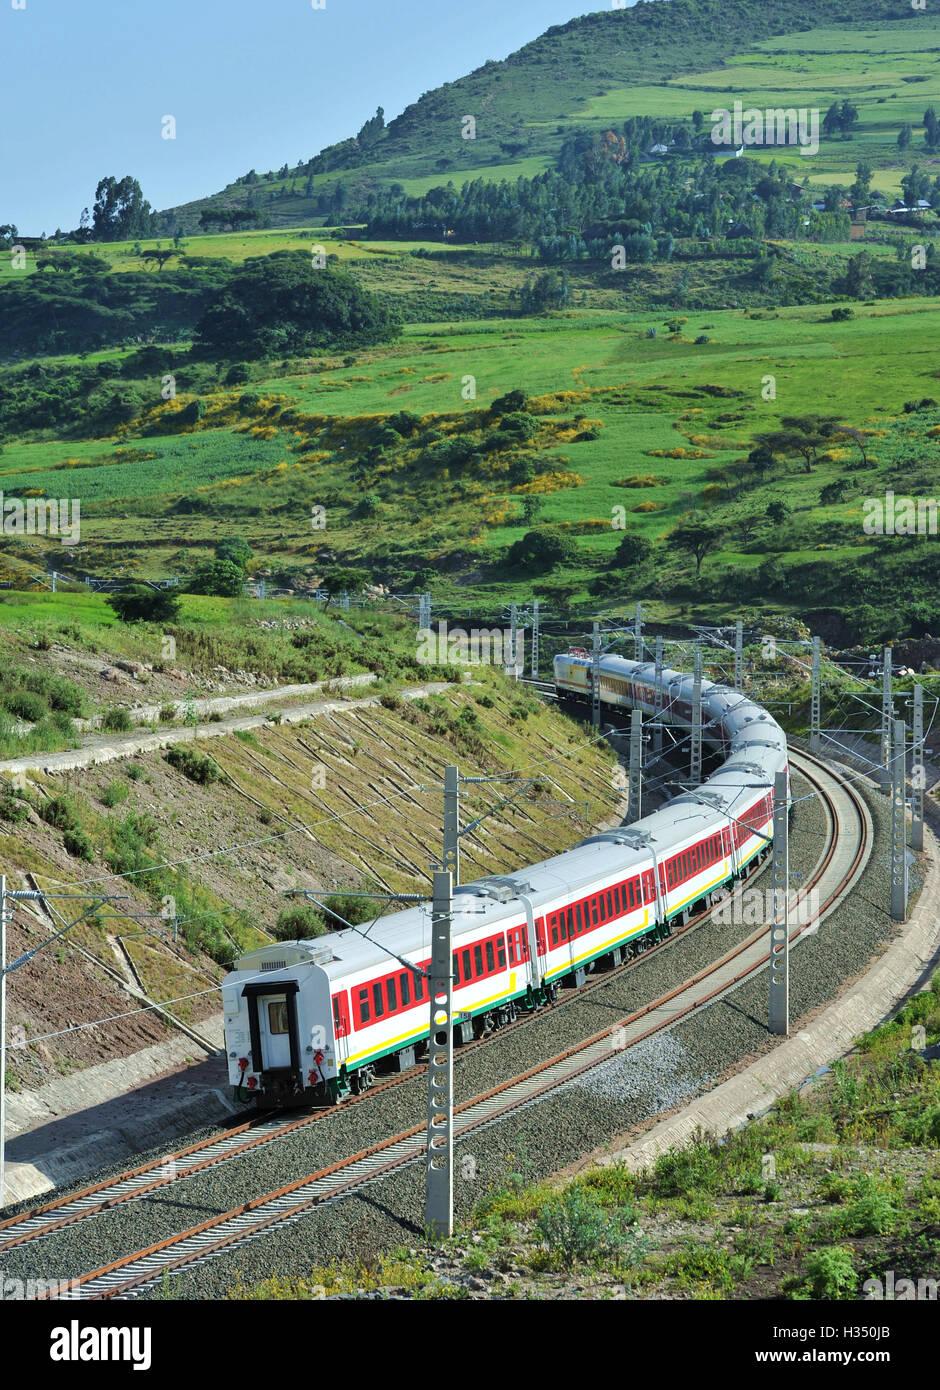 Addis Ababa, Ethiopia  3rd Oct, 2016  A train runs on the